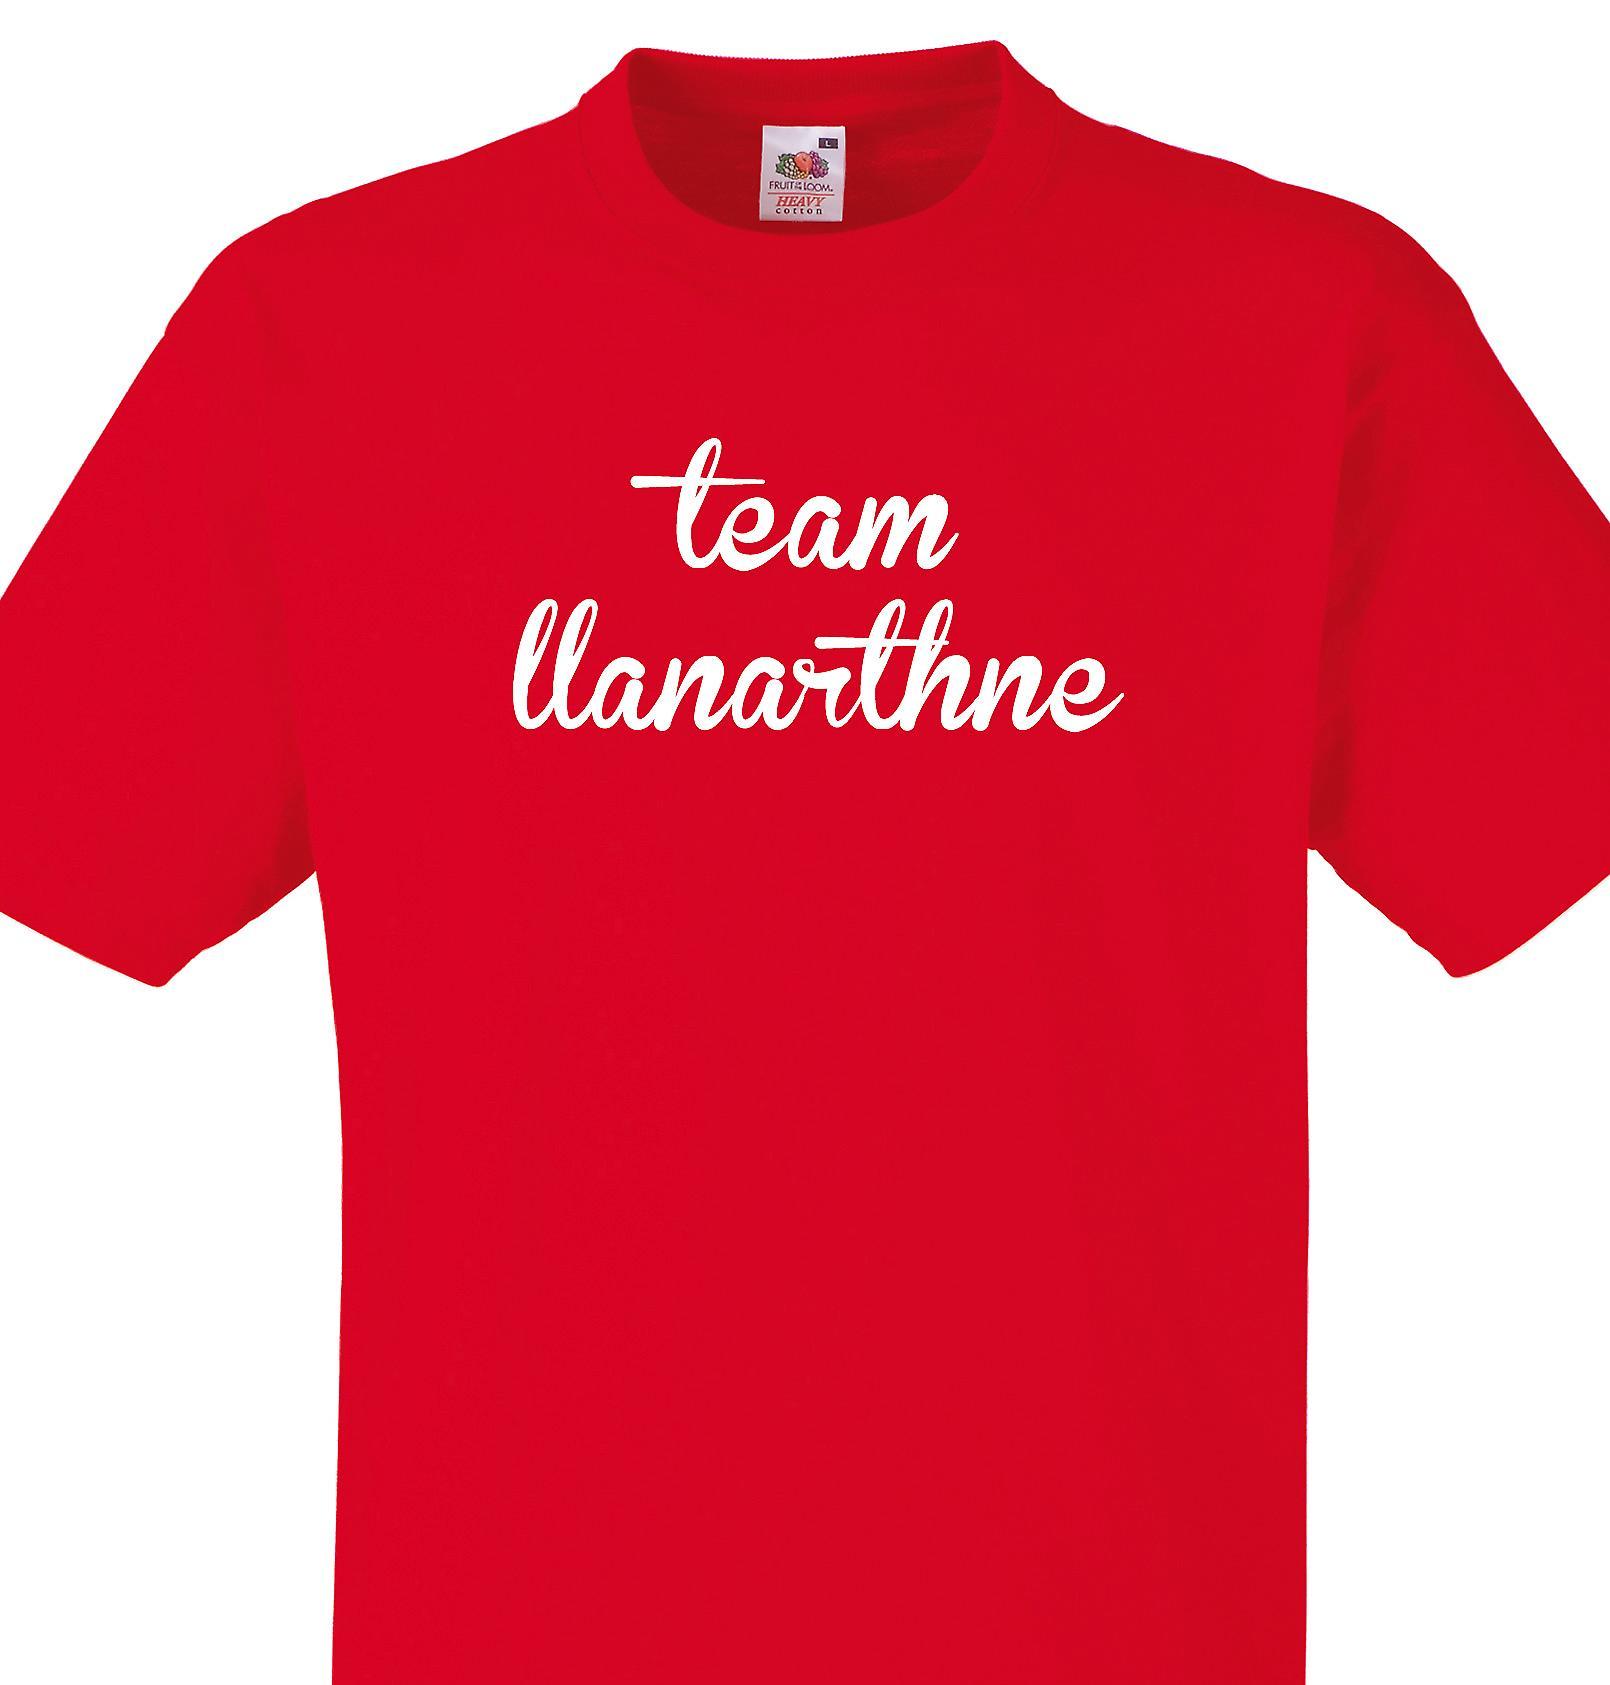 Team Llanarthne Red T shirt